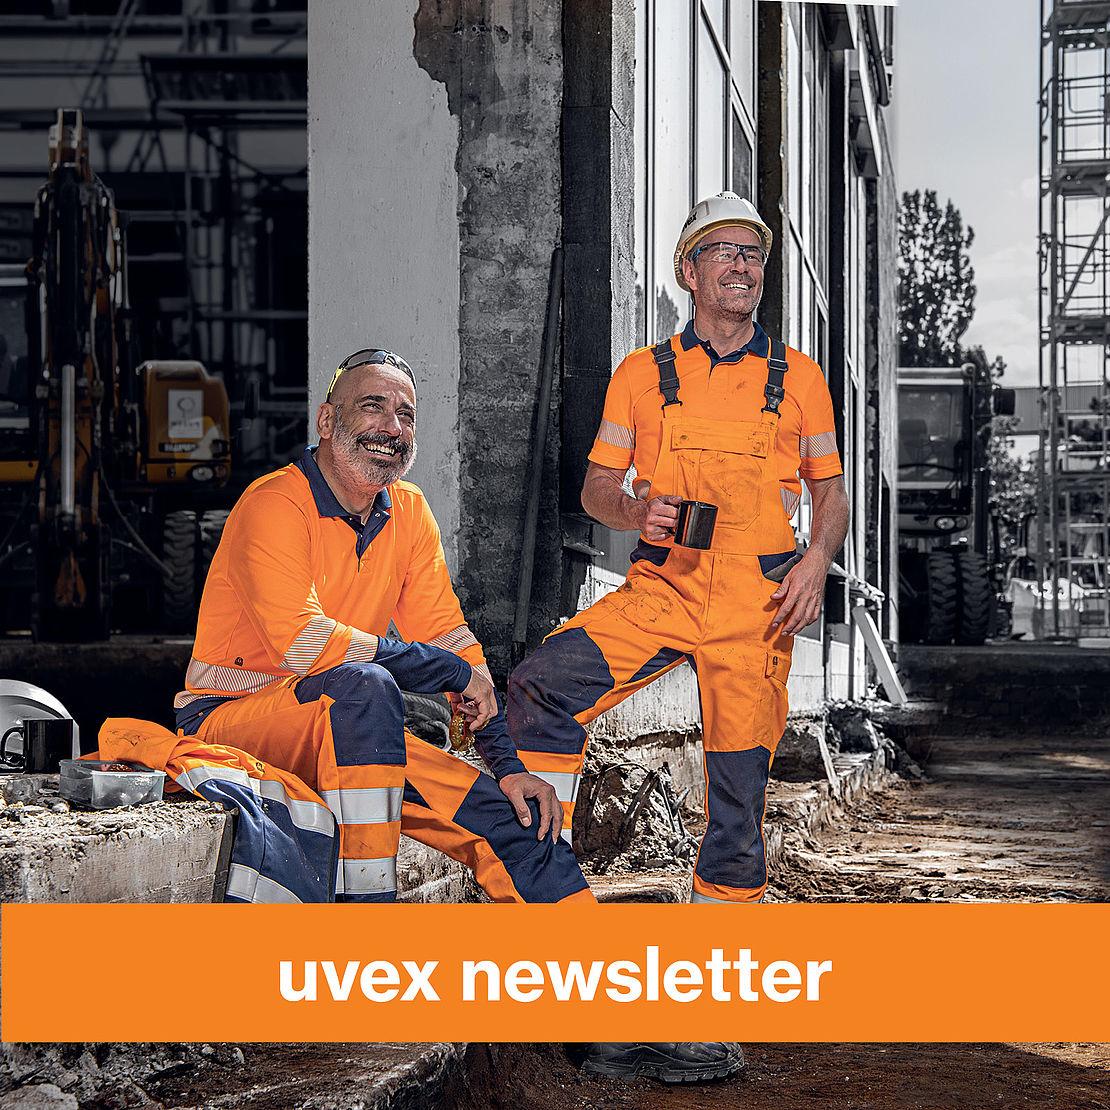 uvex newsletter